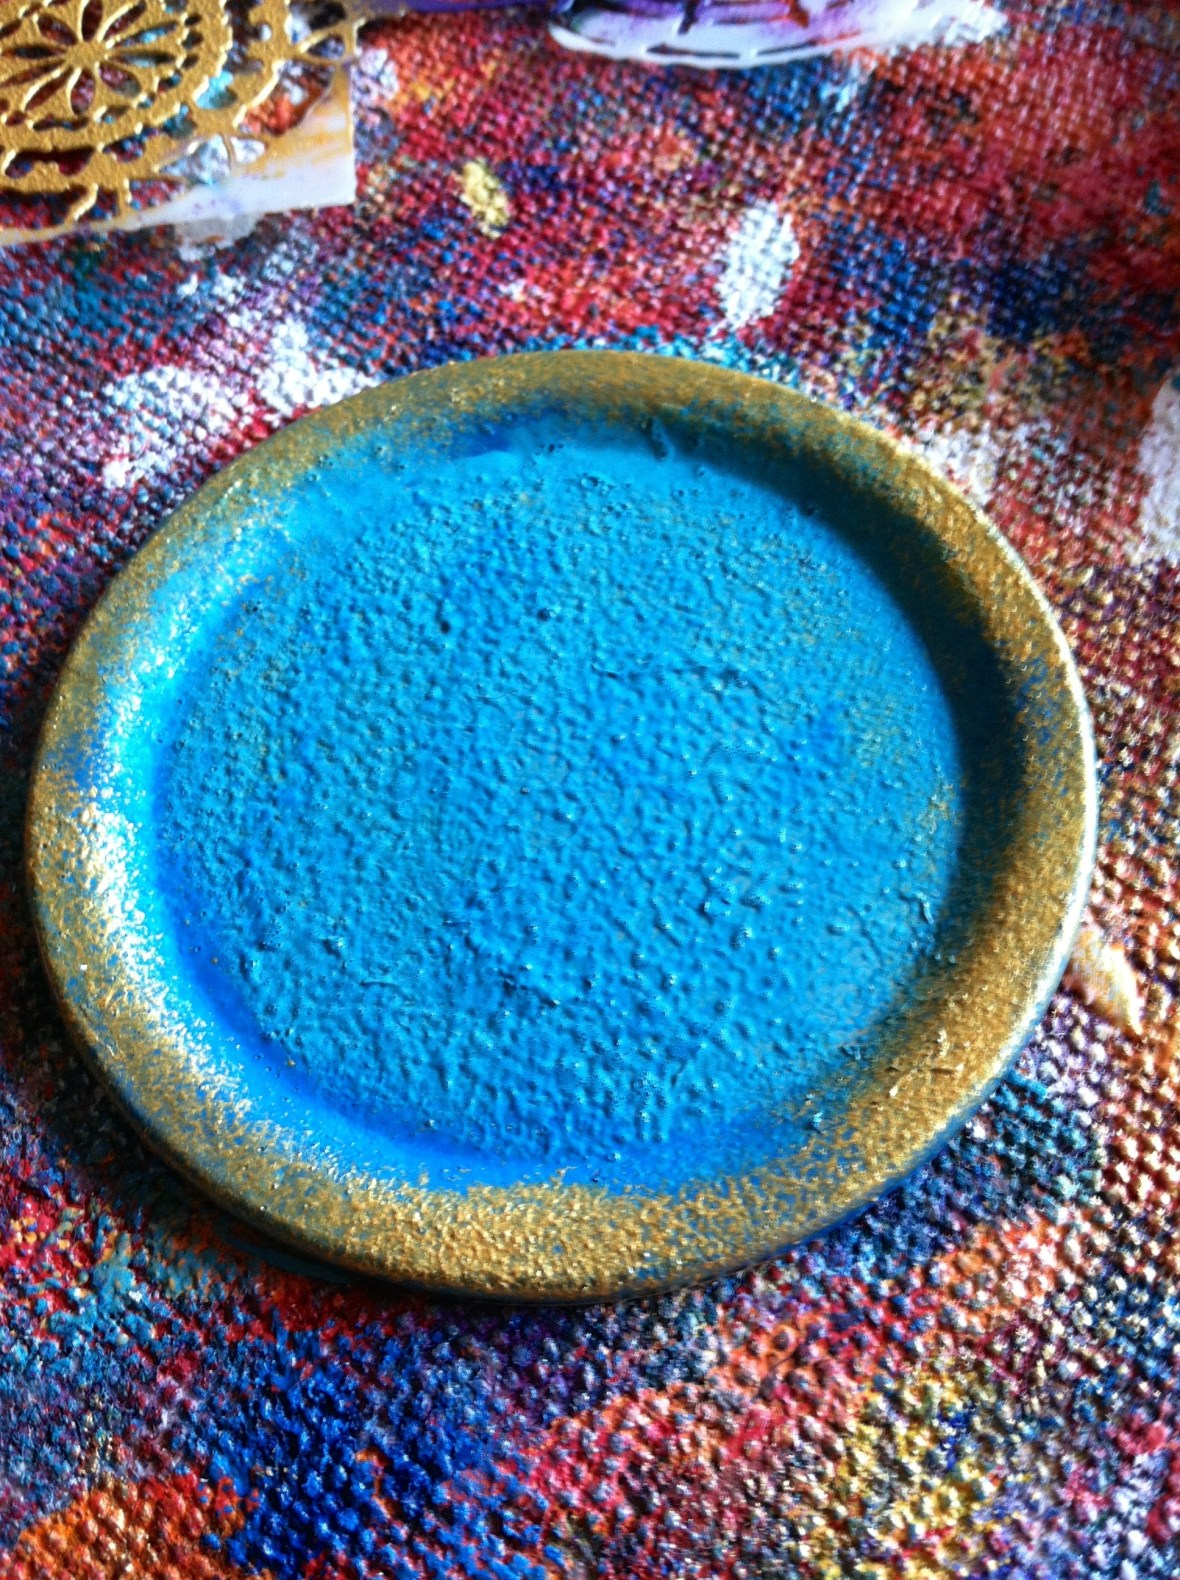 Painted lid